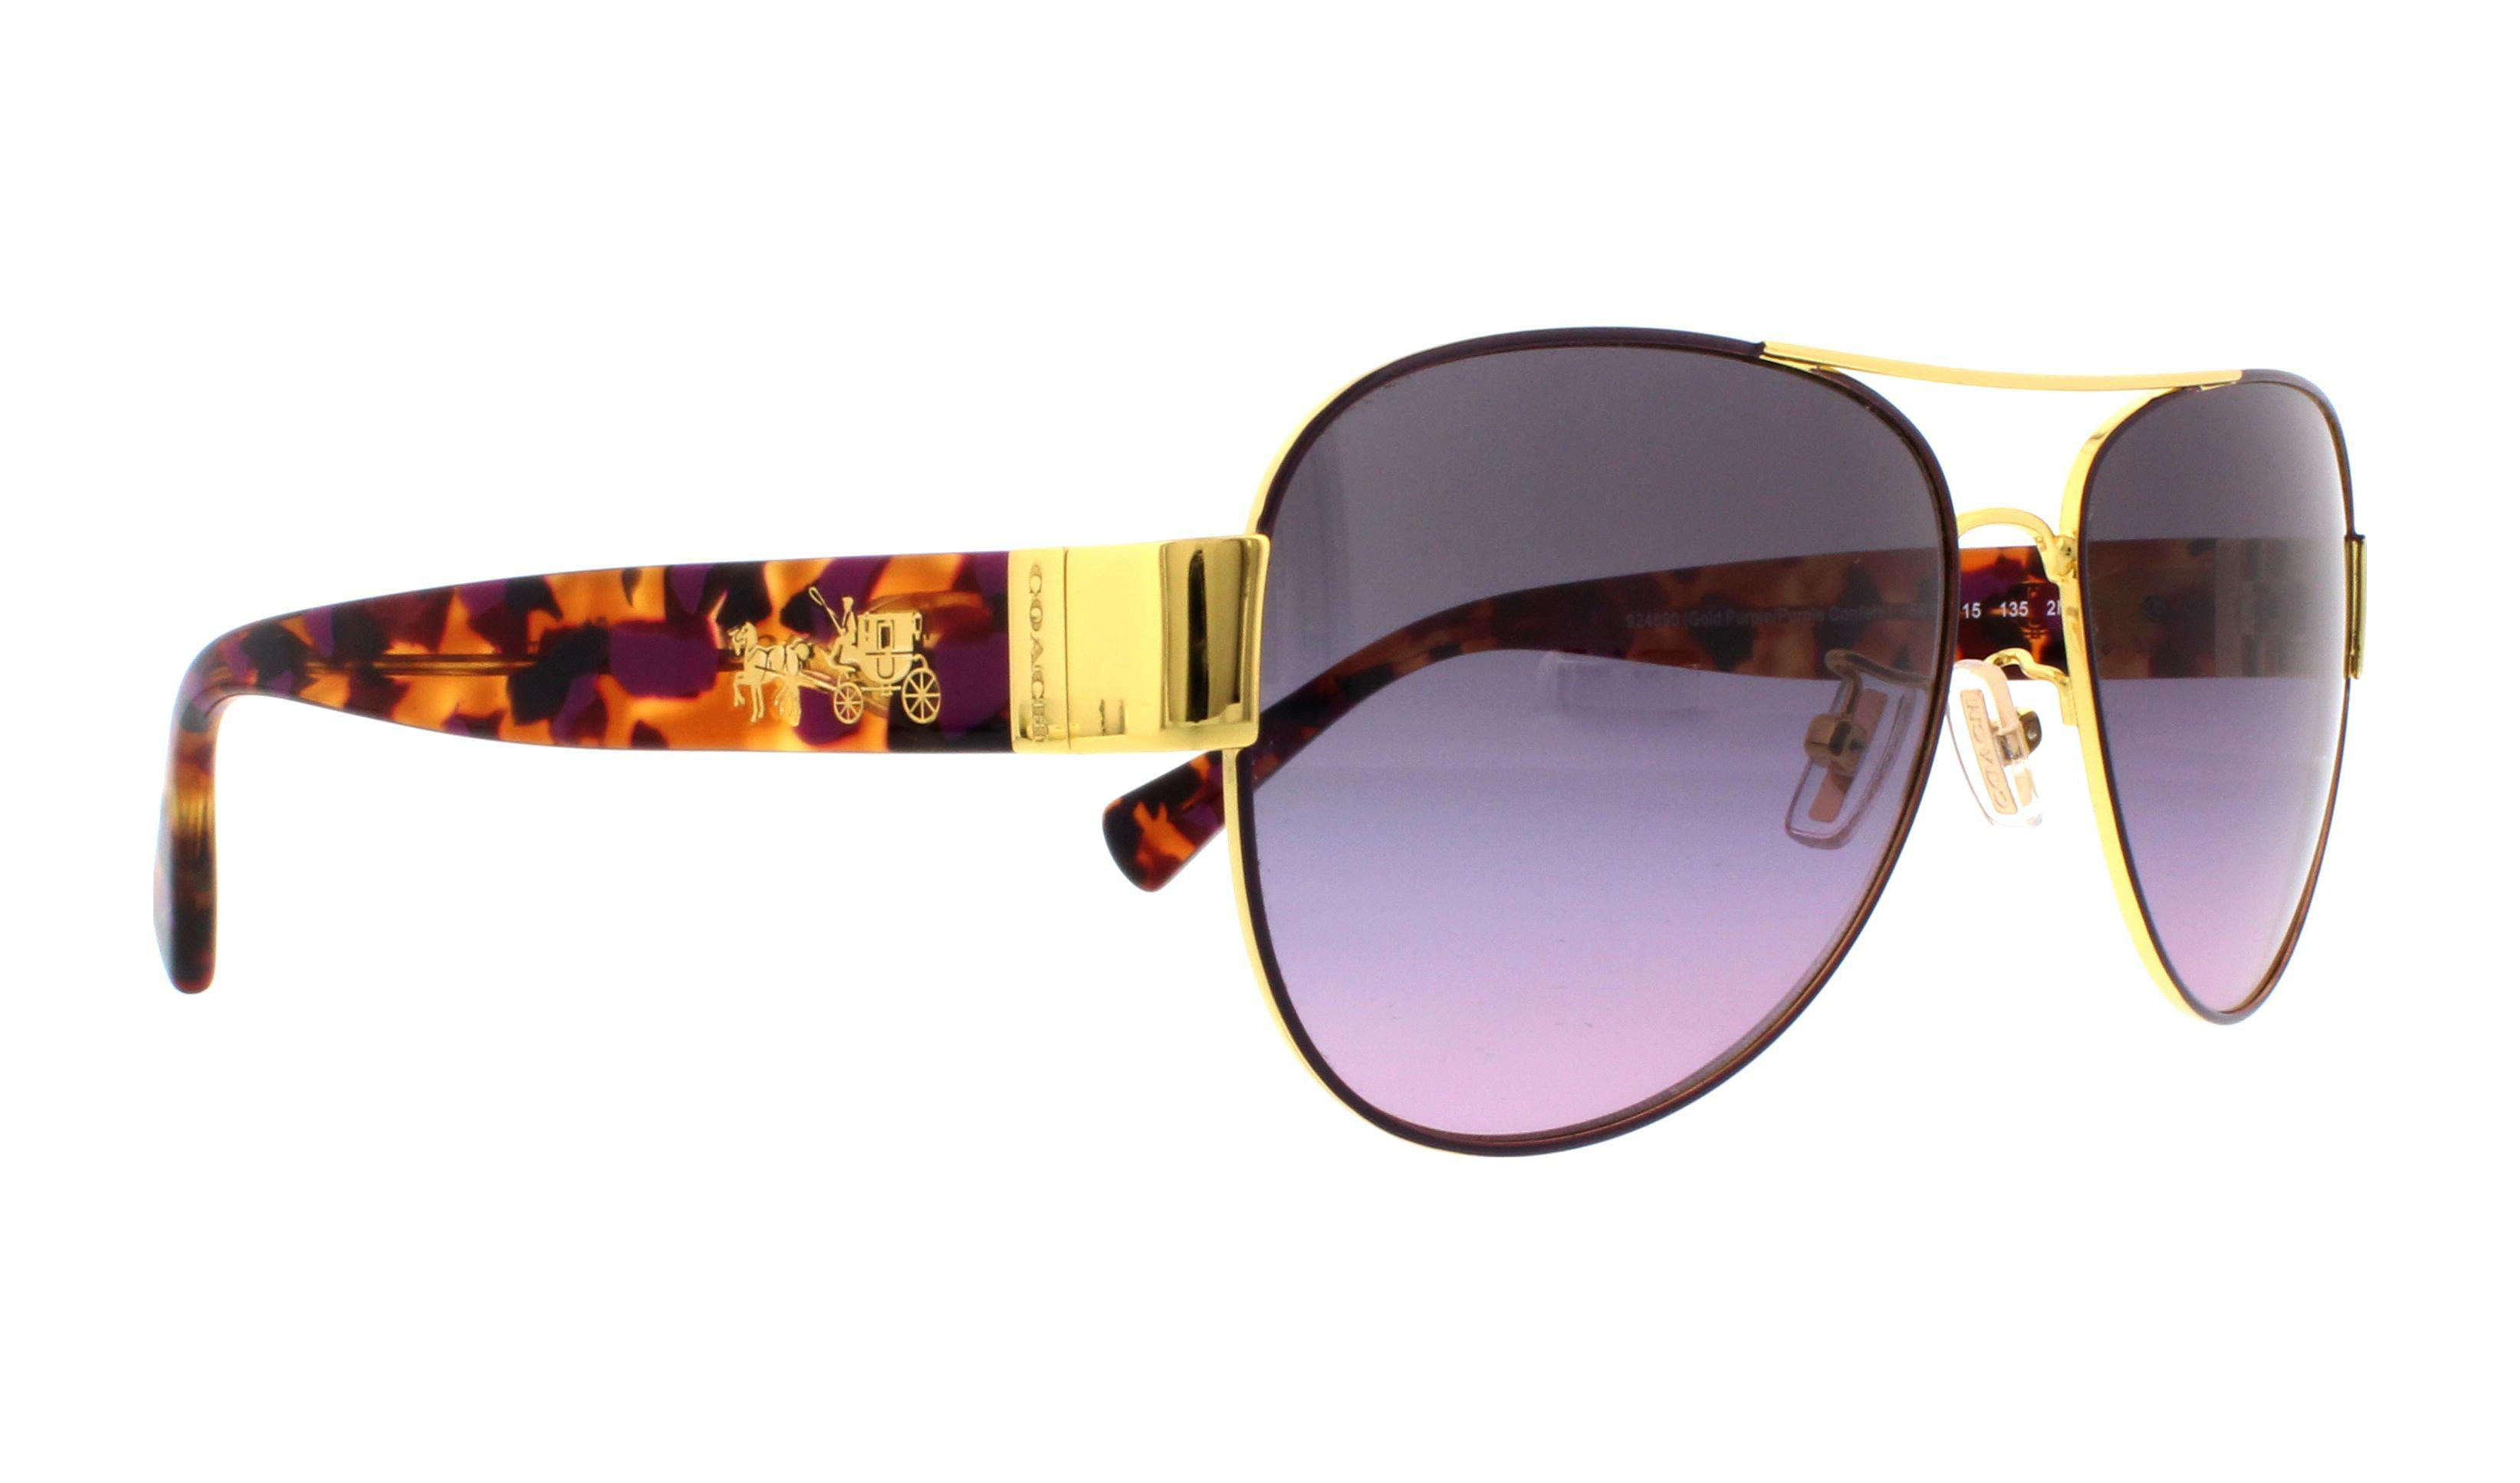 2fd61c5e3d ... switzerland coach sunglasses hc 7059 9238t5 gold dark tortoise 58mm  walmart bf769 a0f64